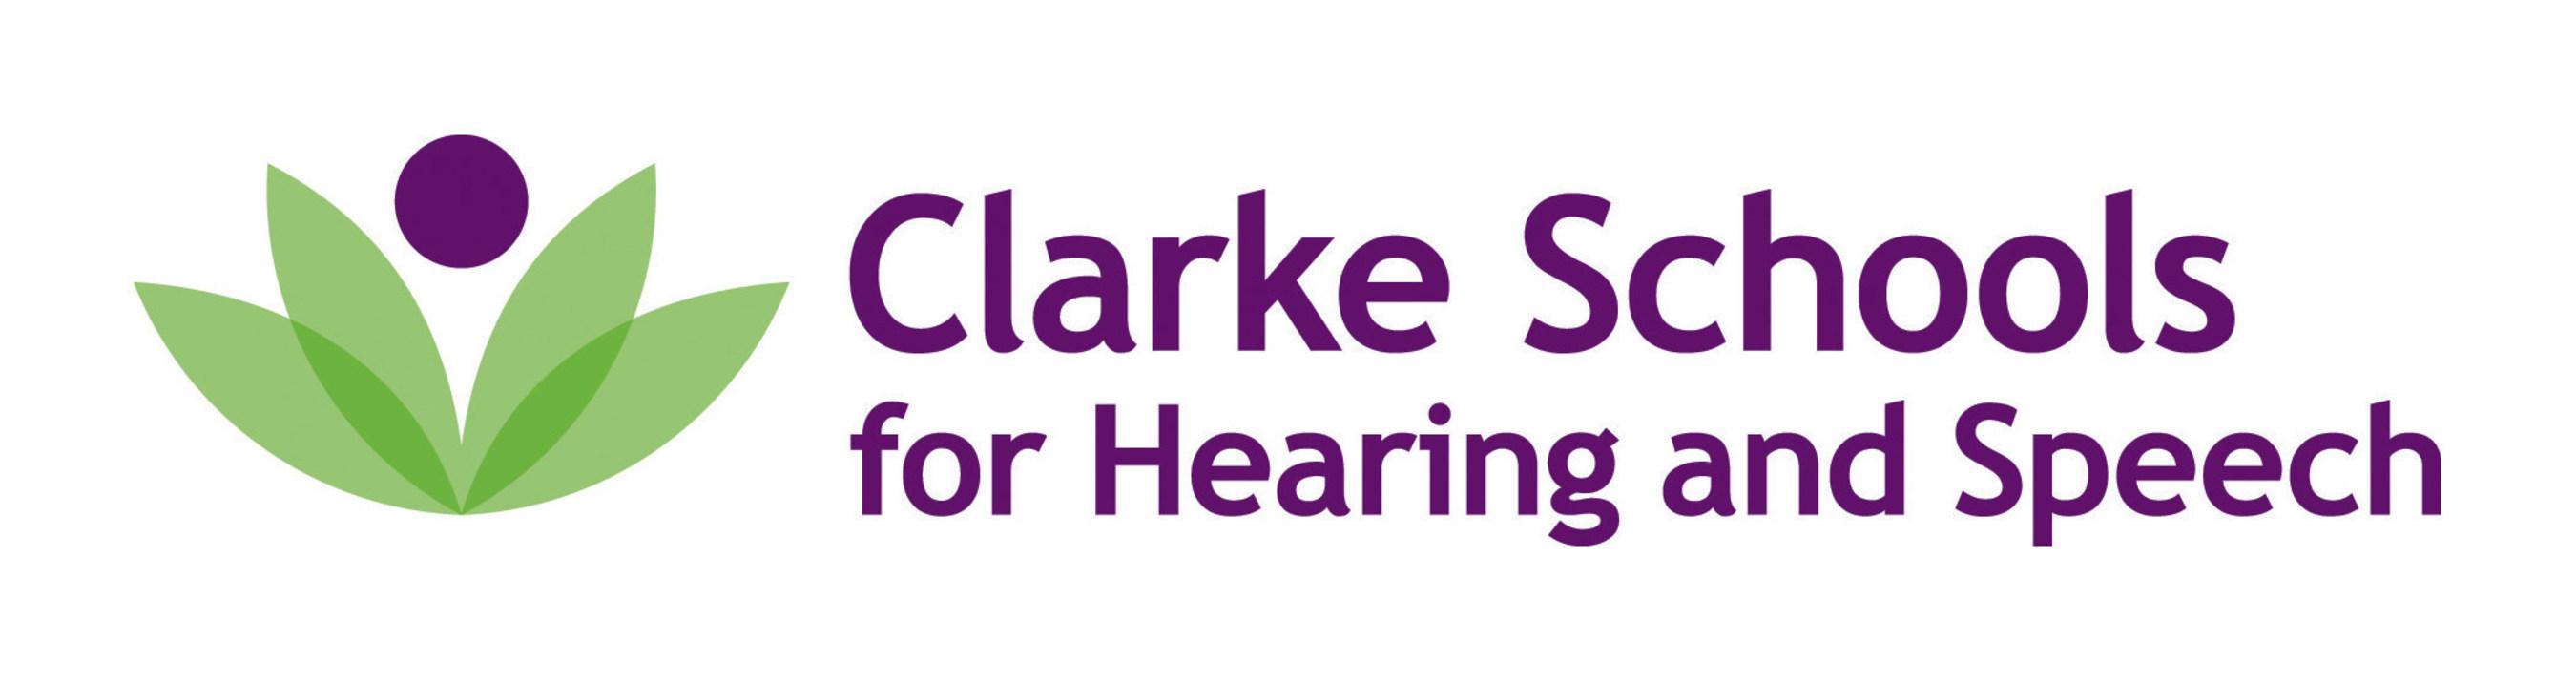 Clarke Schools for Hearing and Speech logo